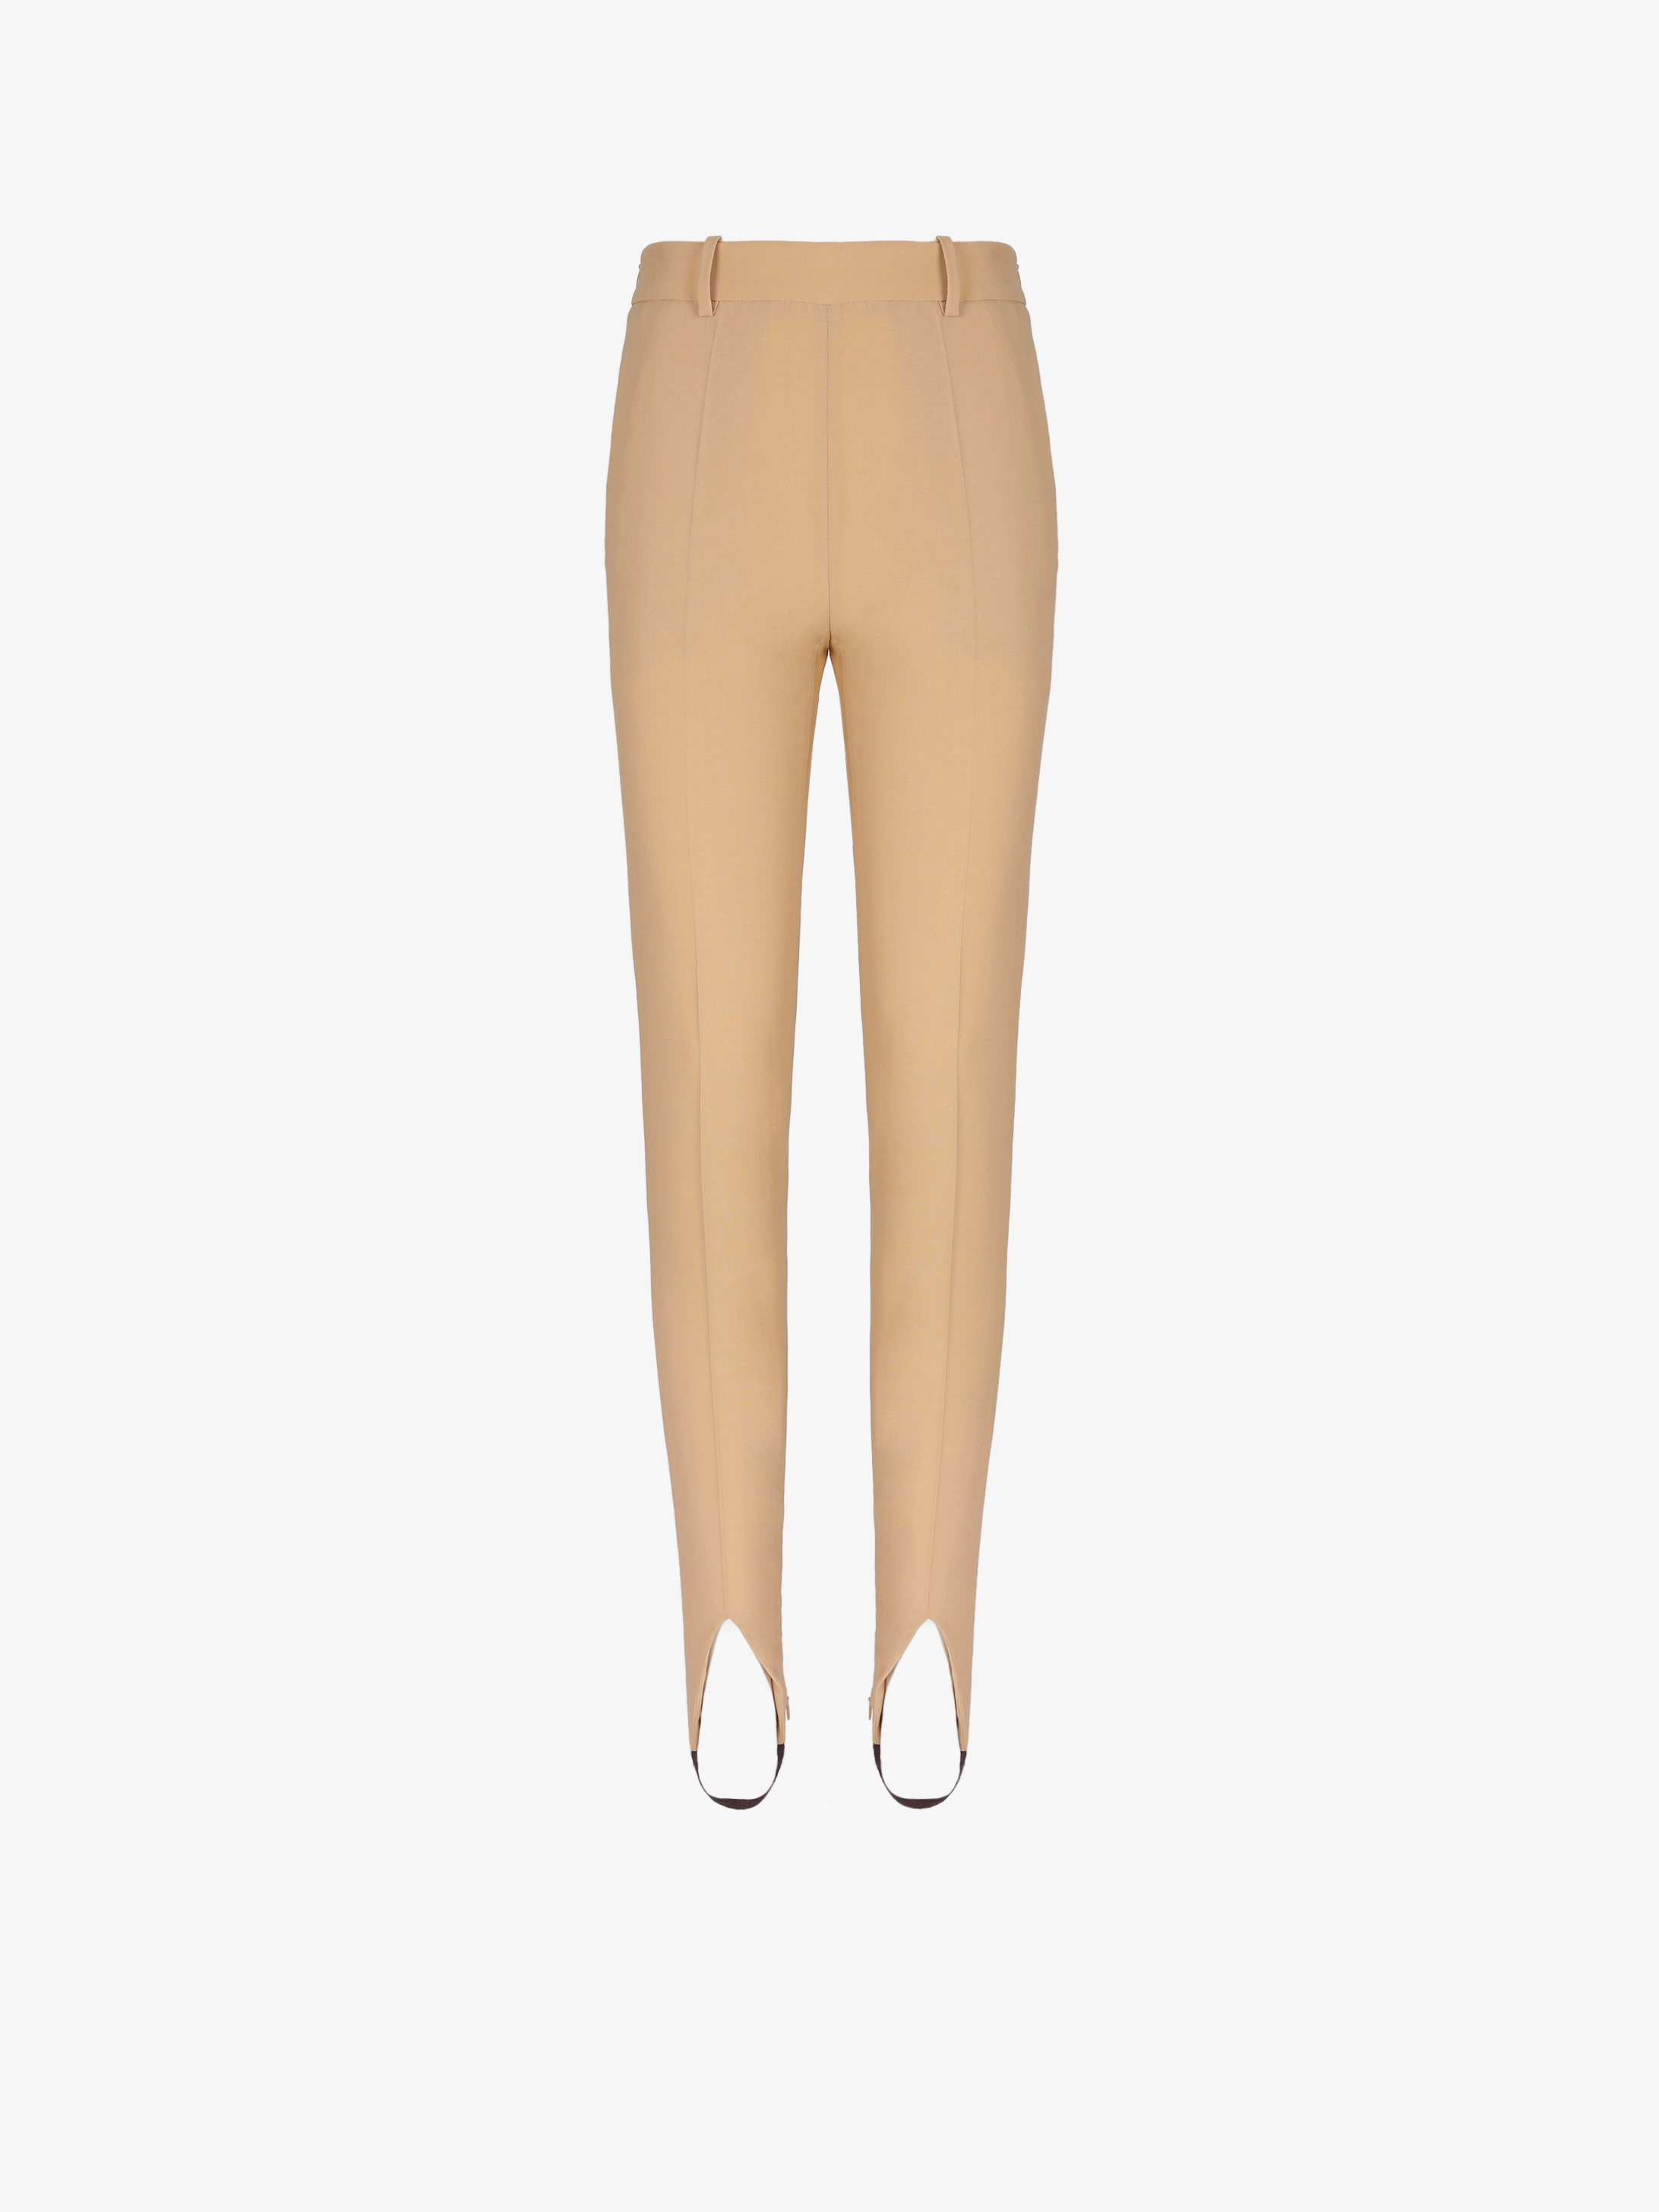 Stirrup pants in wool